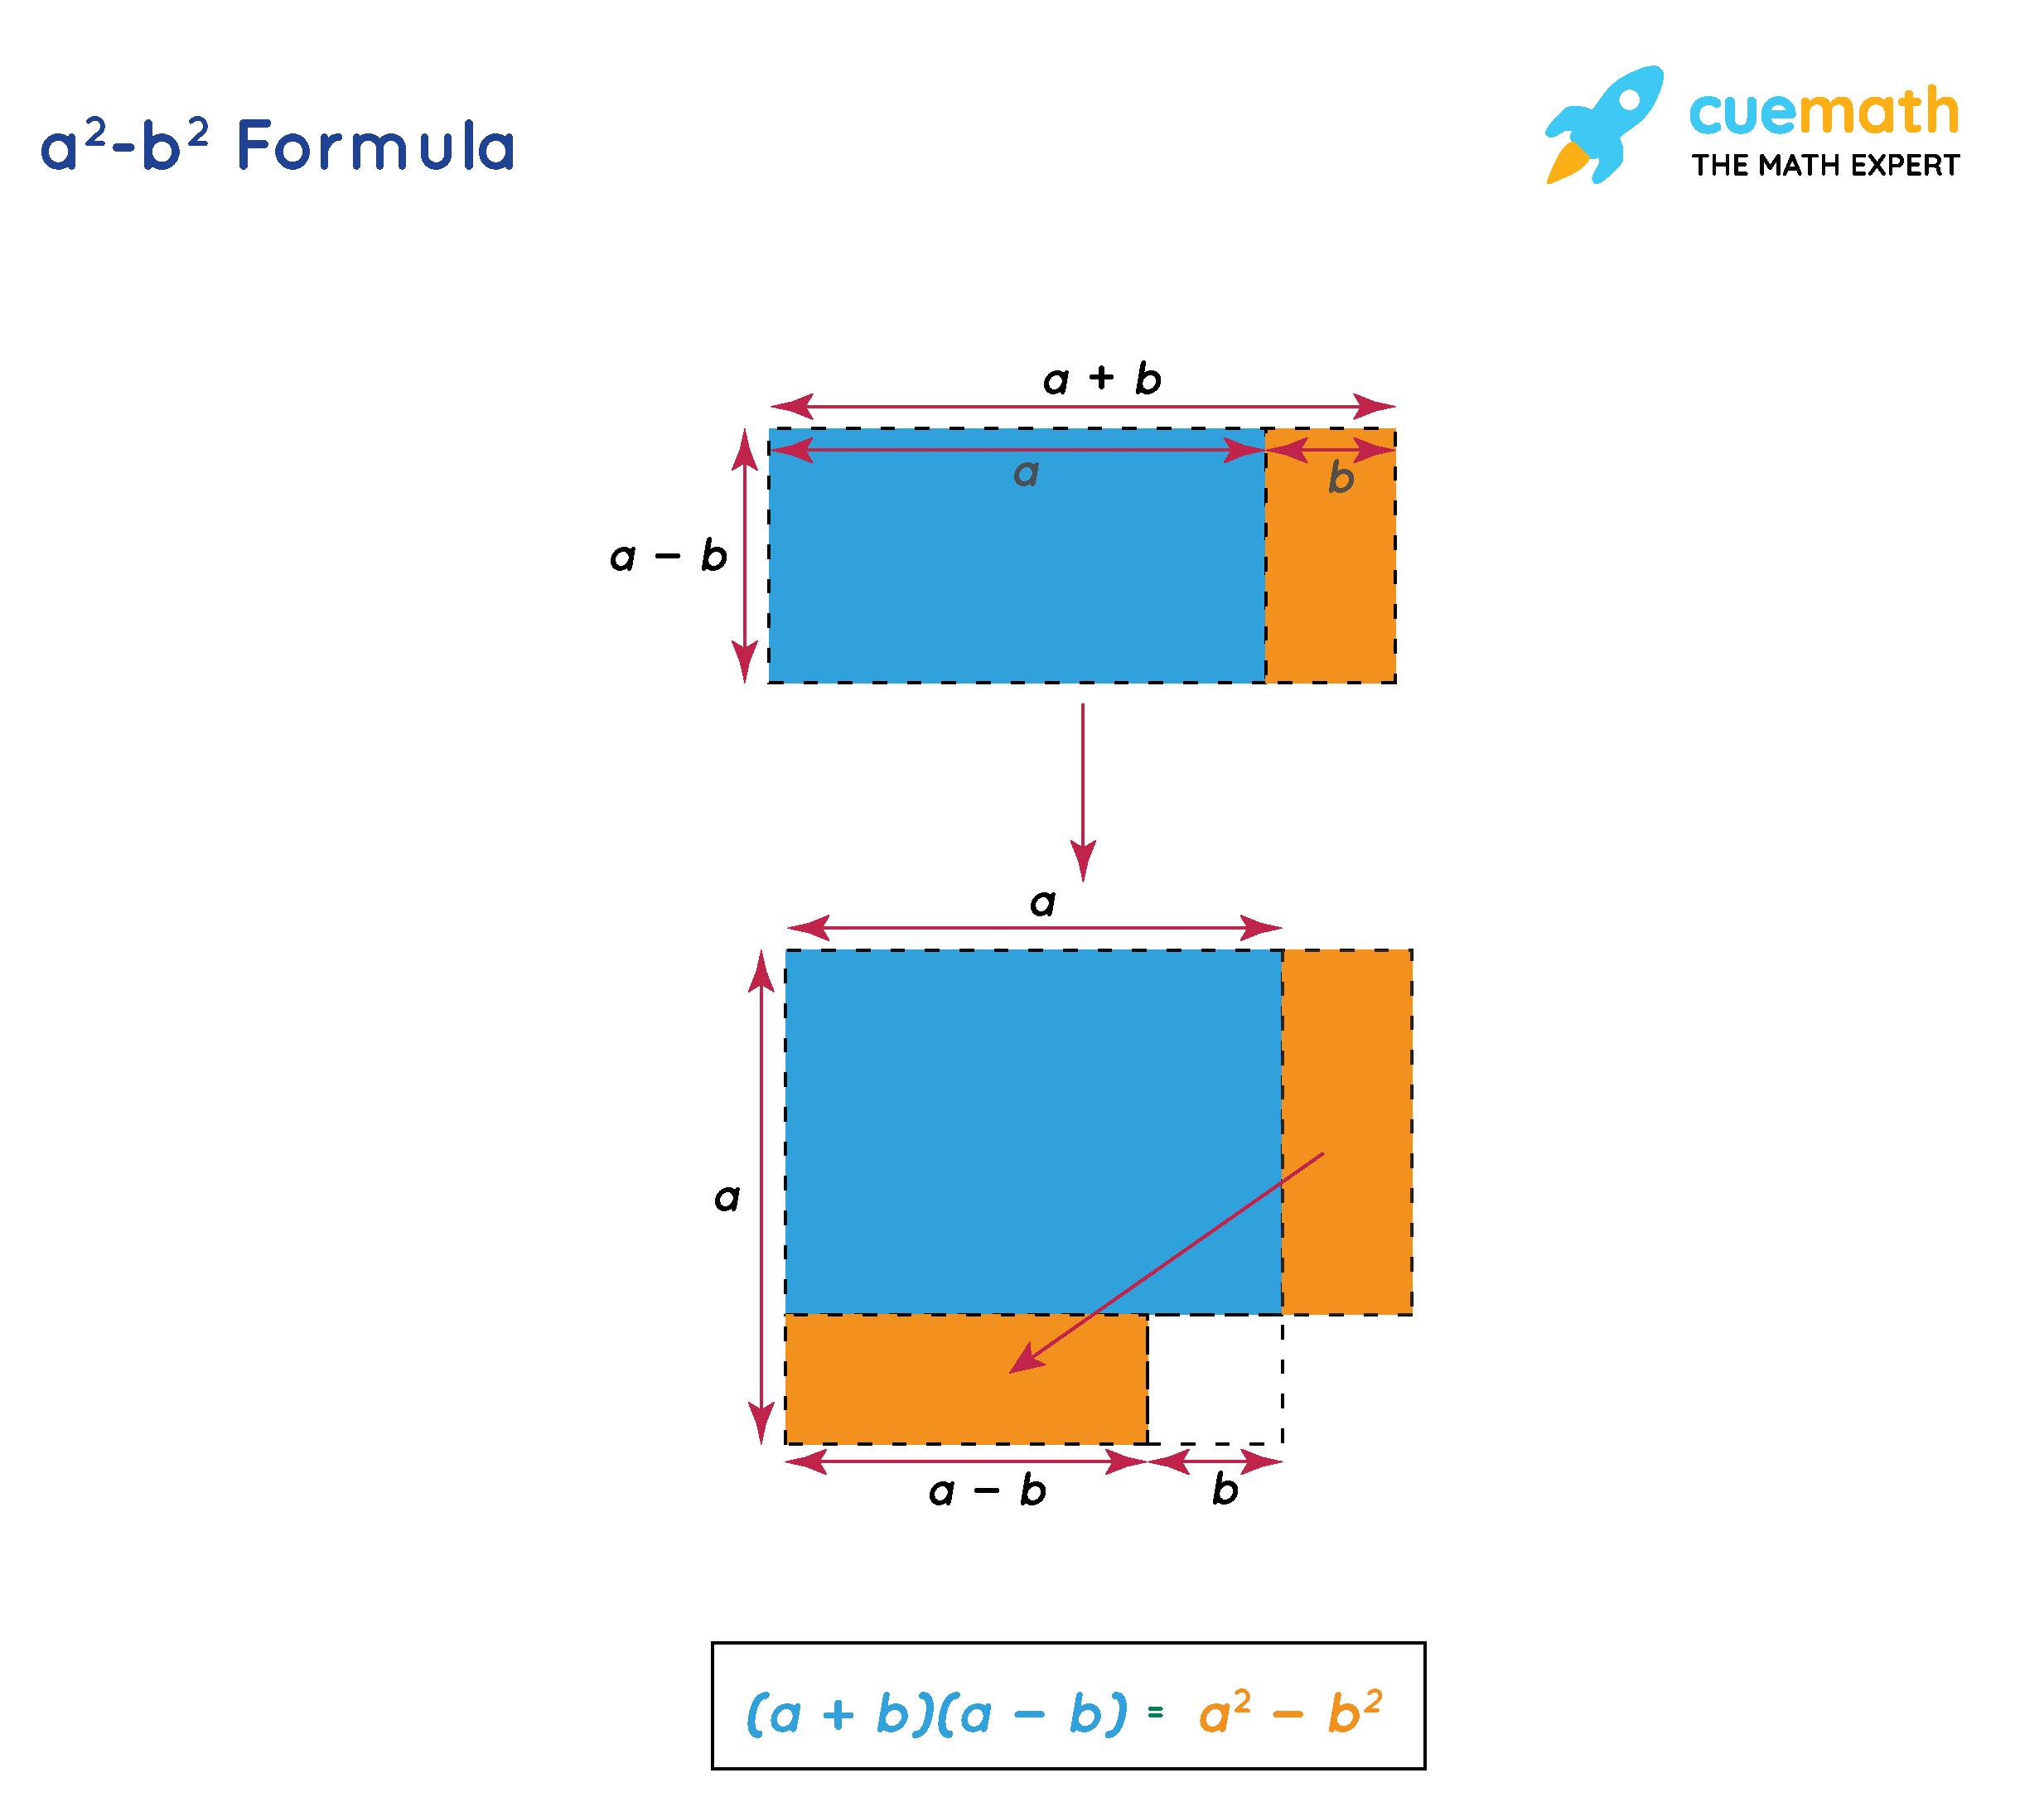 Derivation of an algebraic identities proof of a^2-b^2=(a+b)(a-b)